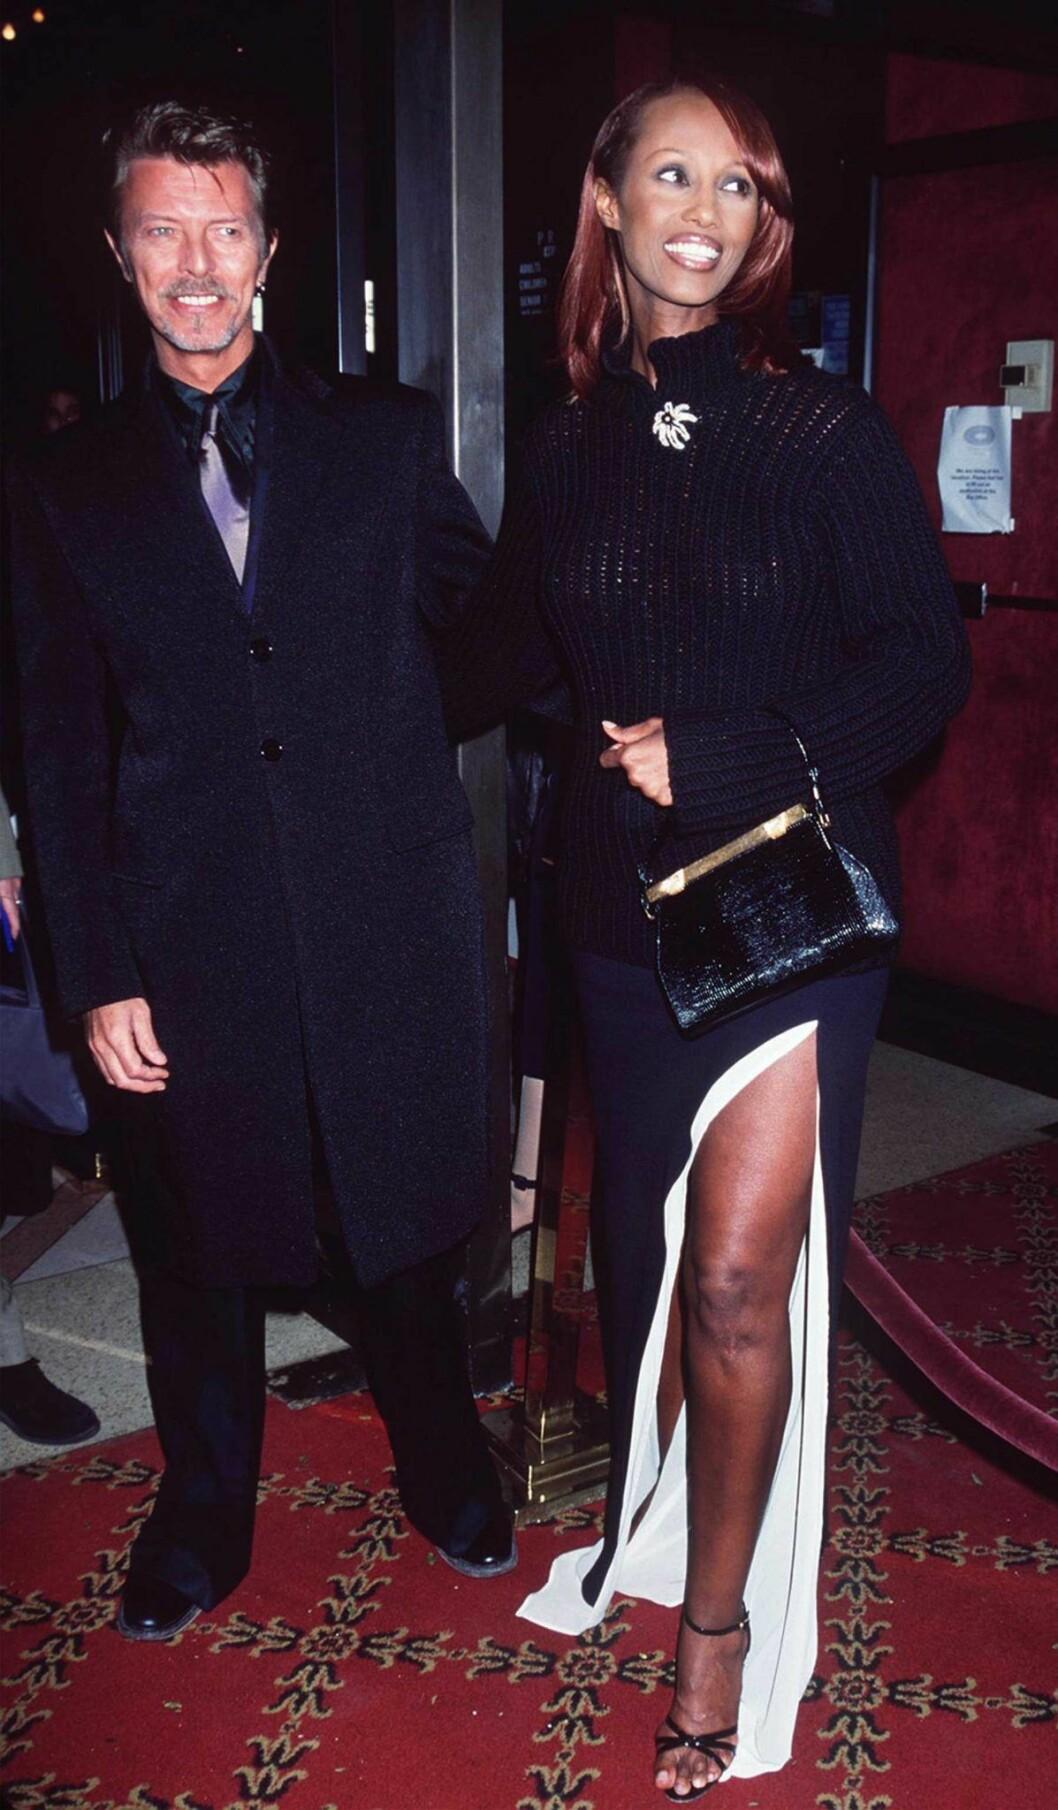 Paret David Bowie och Iman Abdulmajids 90-tals stil